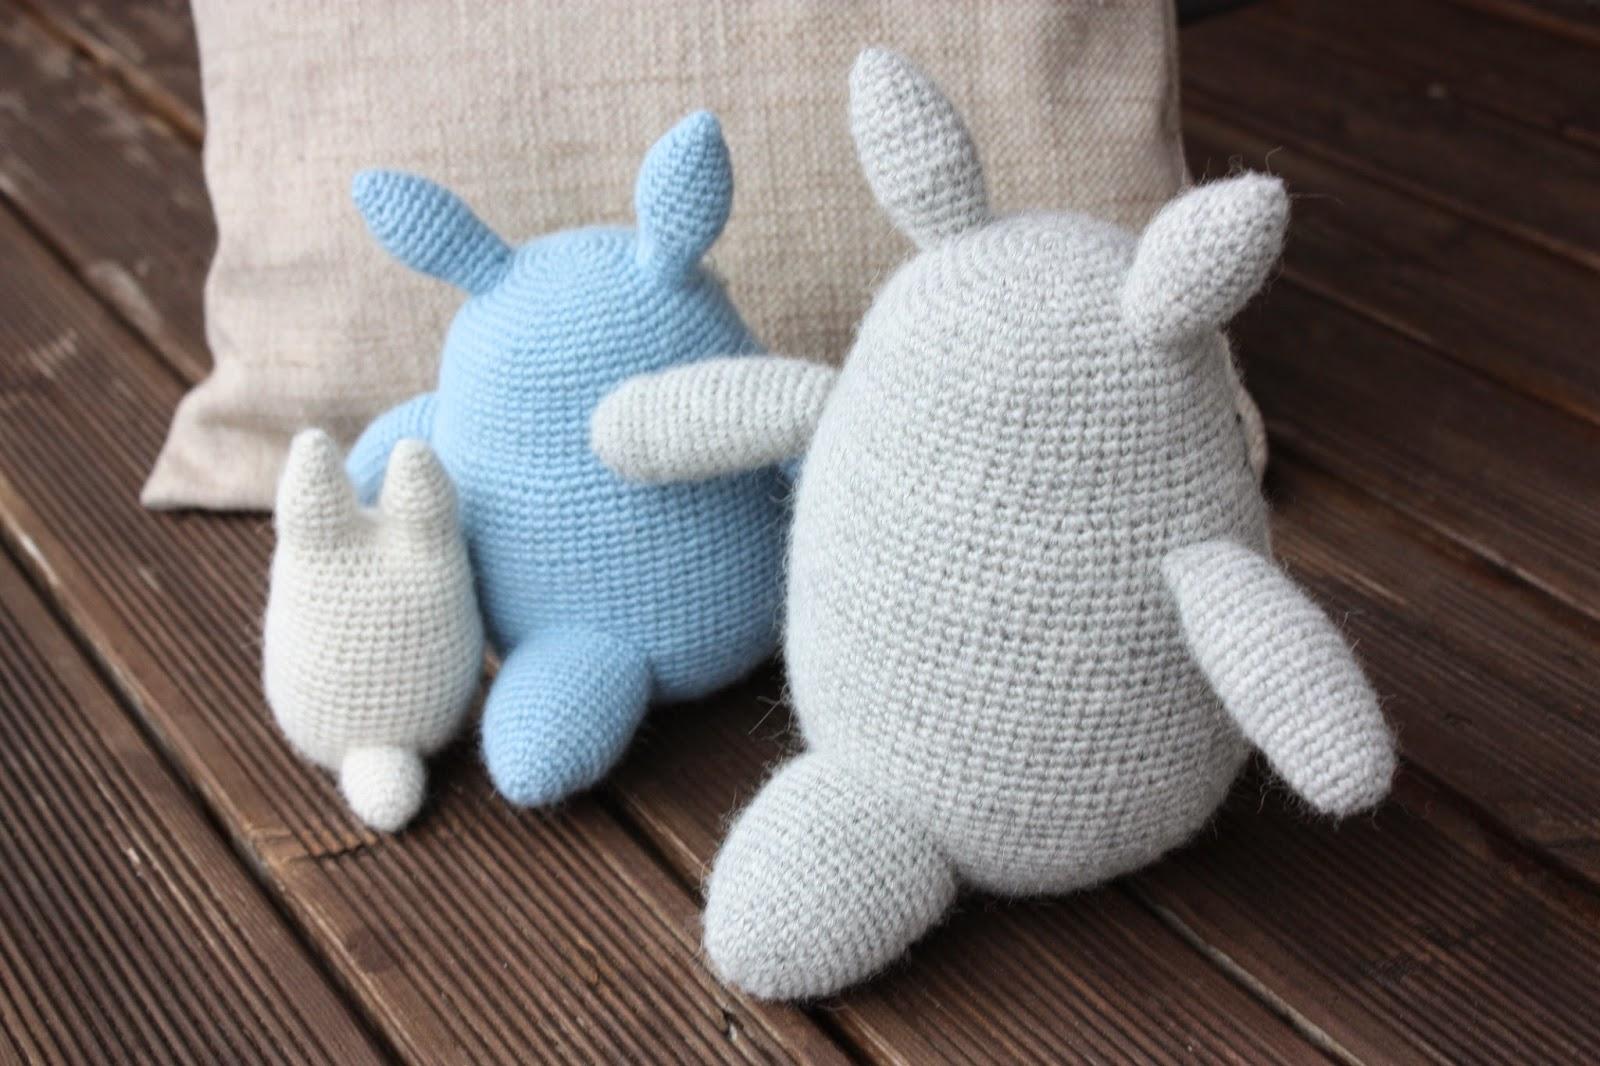 Amigurumi Totoro : Happyamigurumi amigurumi totoros grey blue and white crochet totoro